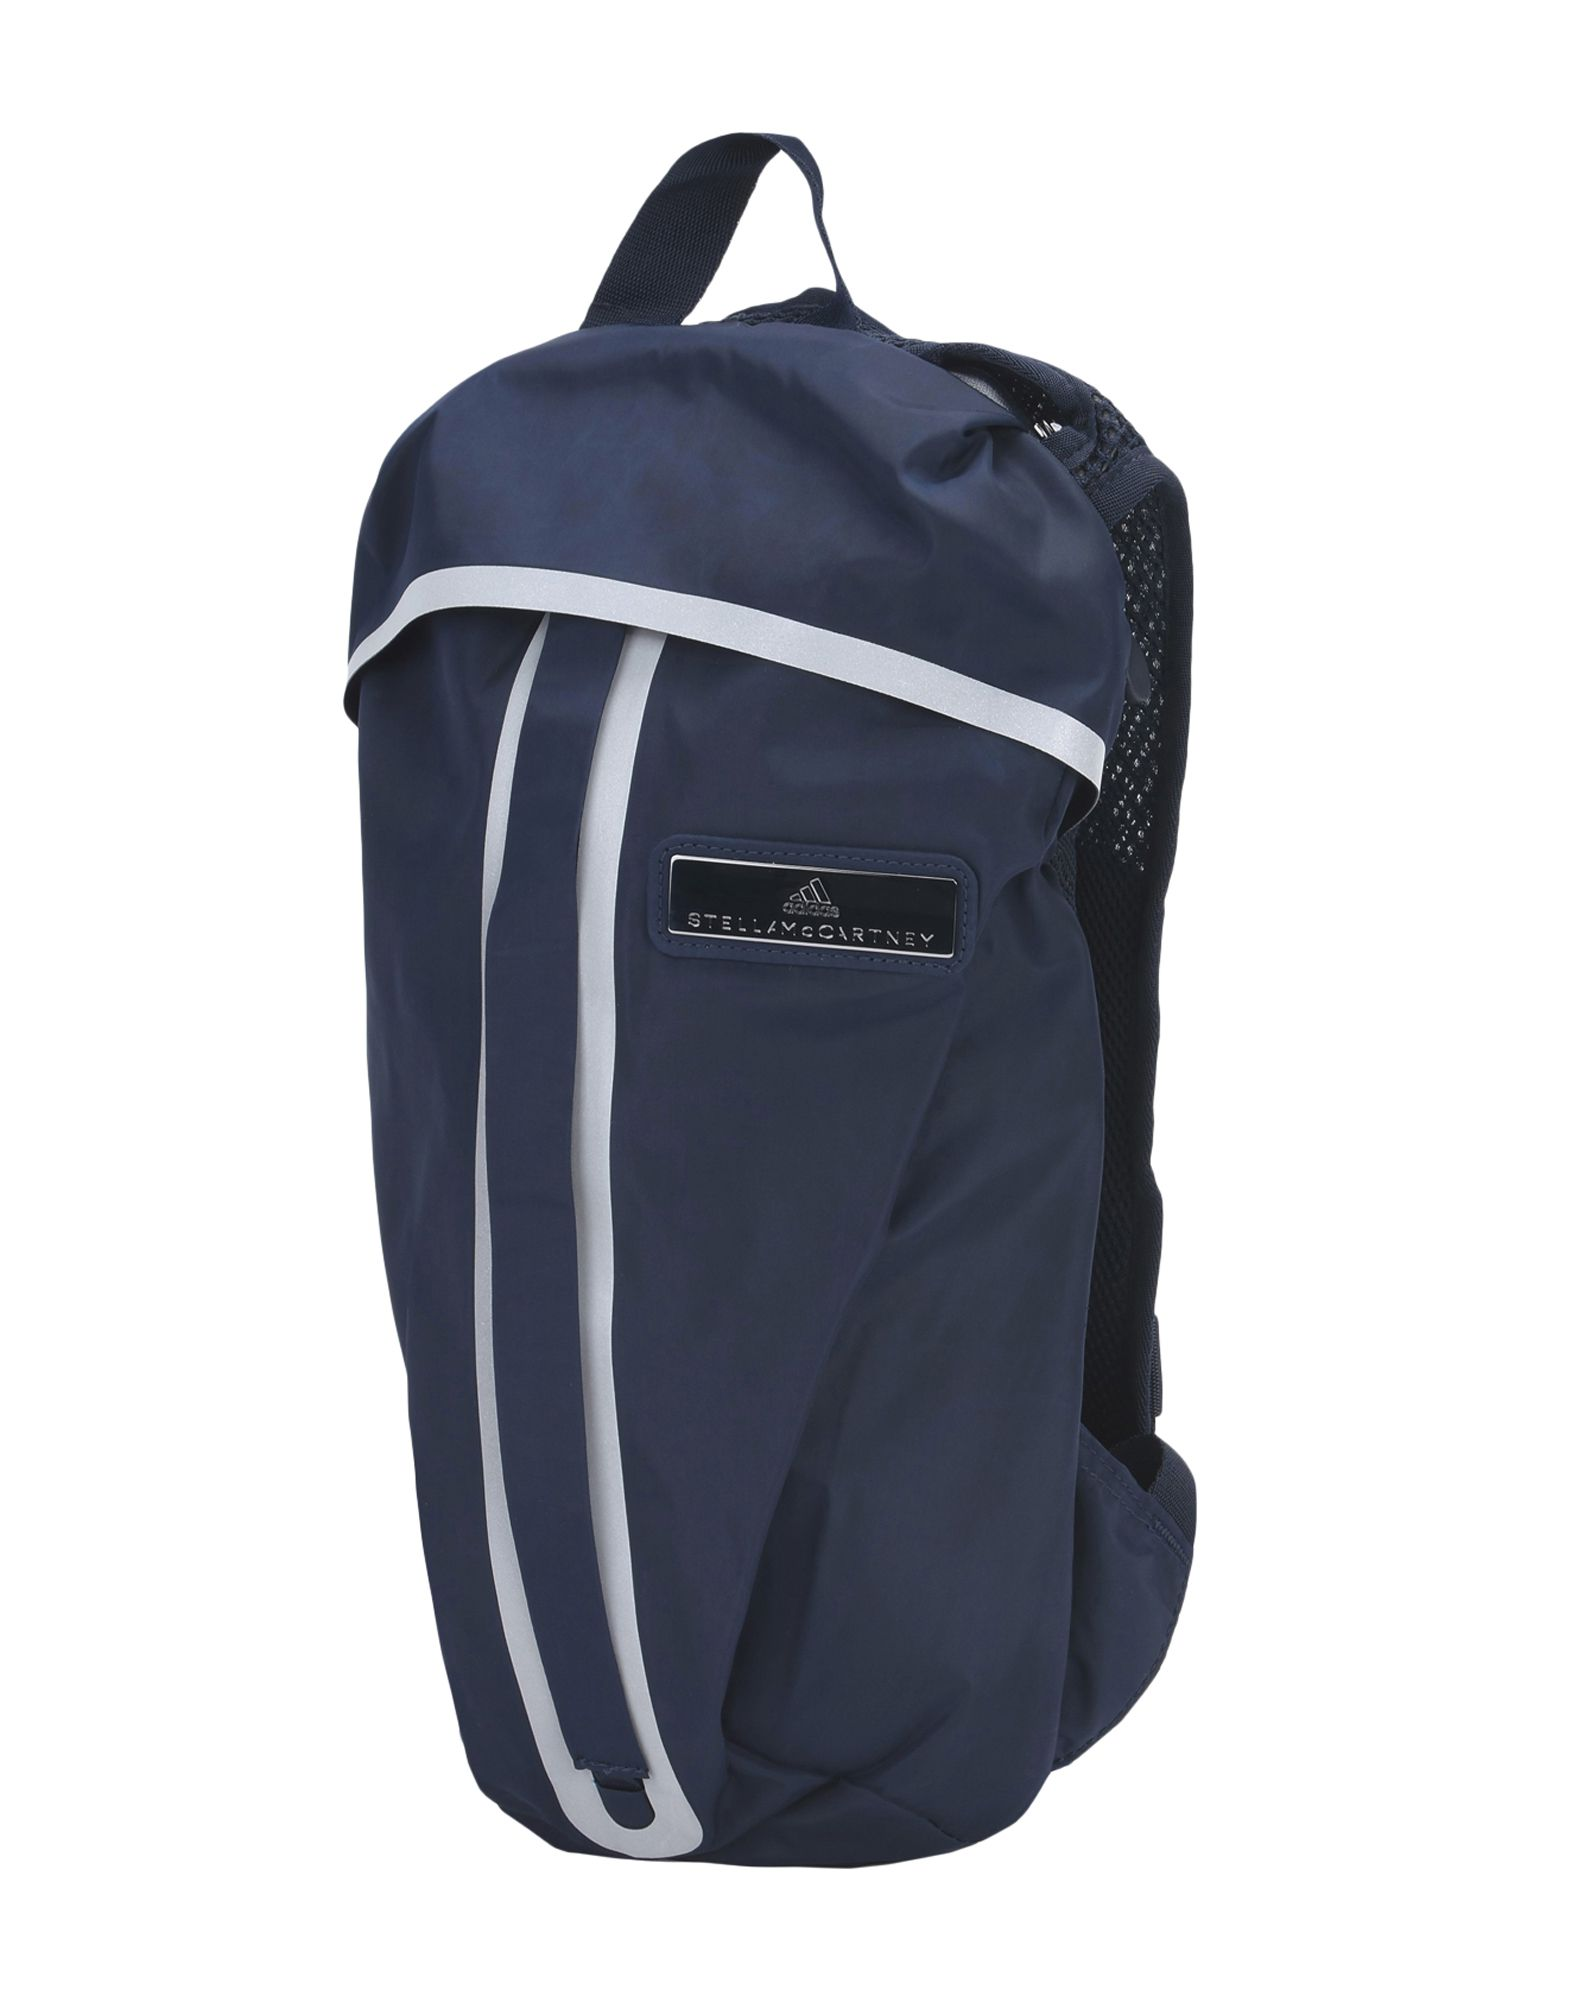 ADIDAS by STELLA McCARTNEY Рюкзаки и сумки на пояс рюкзак stella mccartney черный